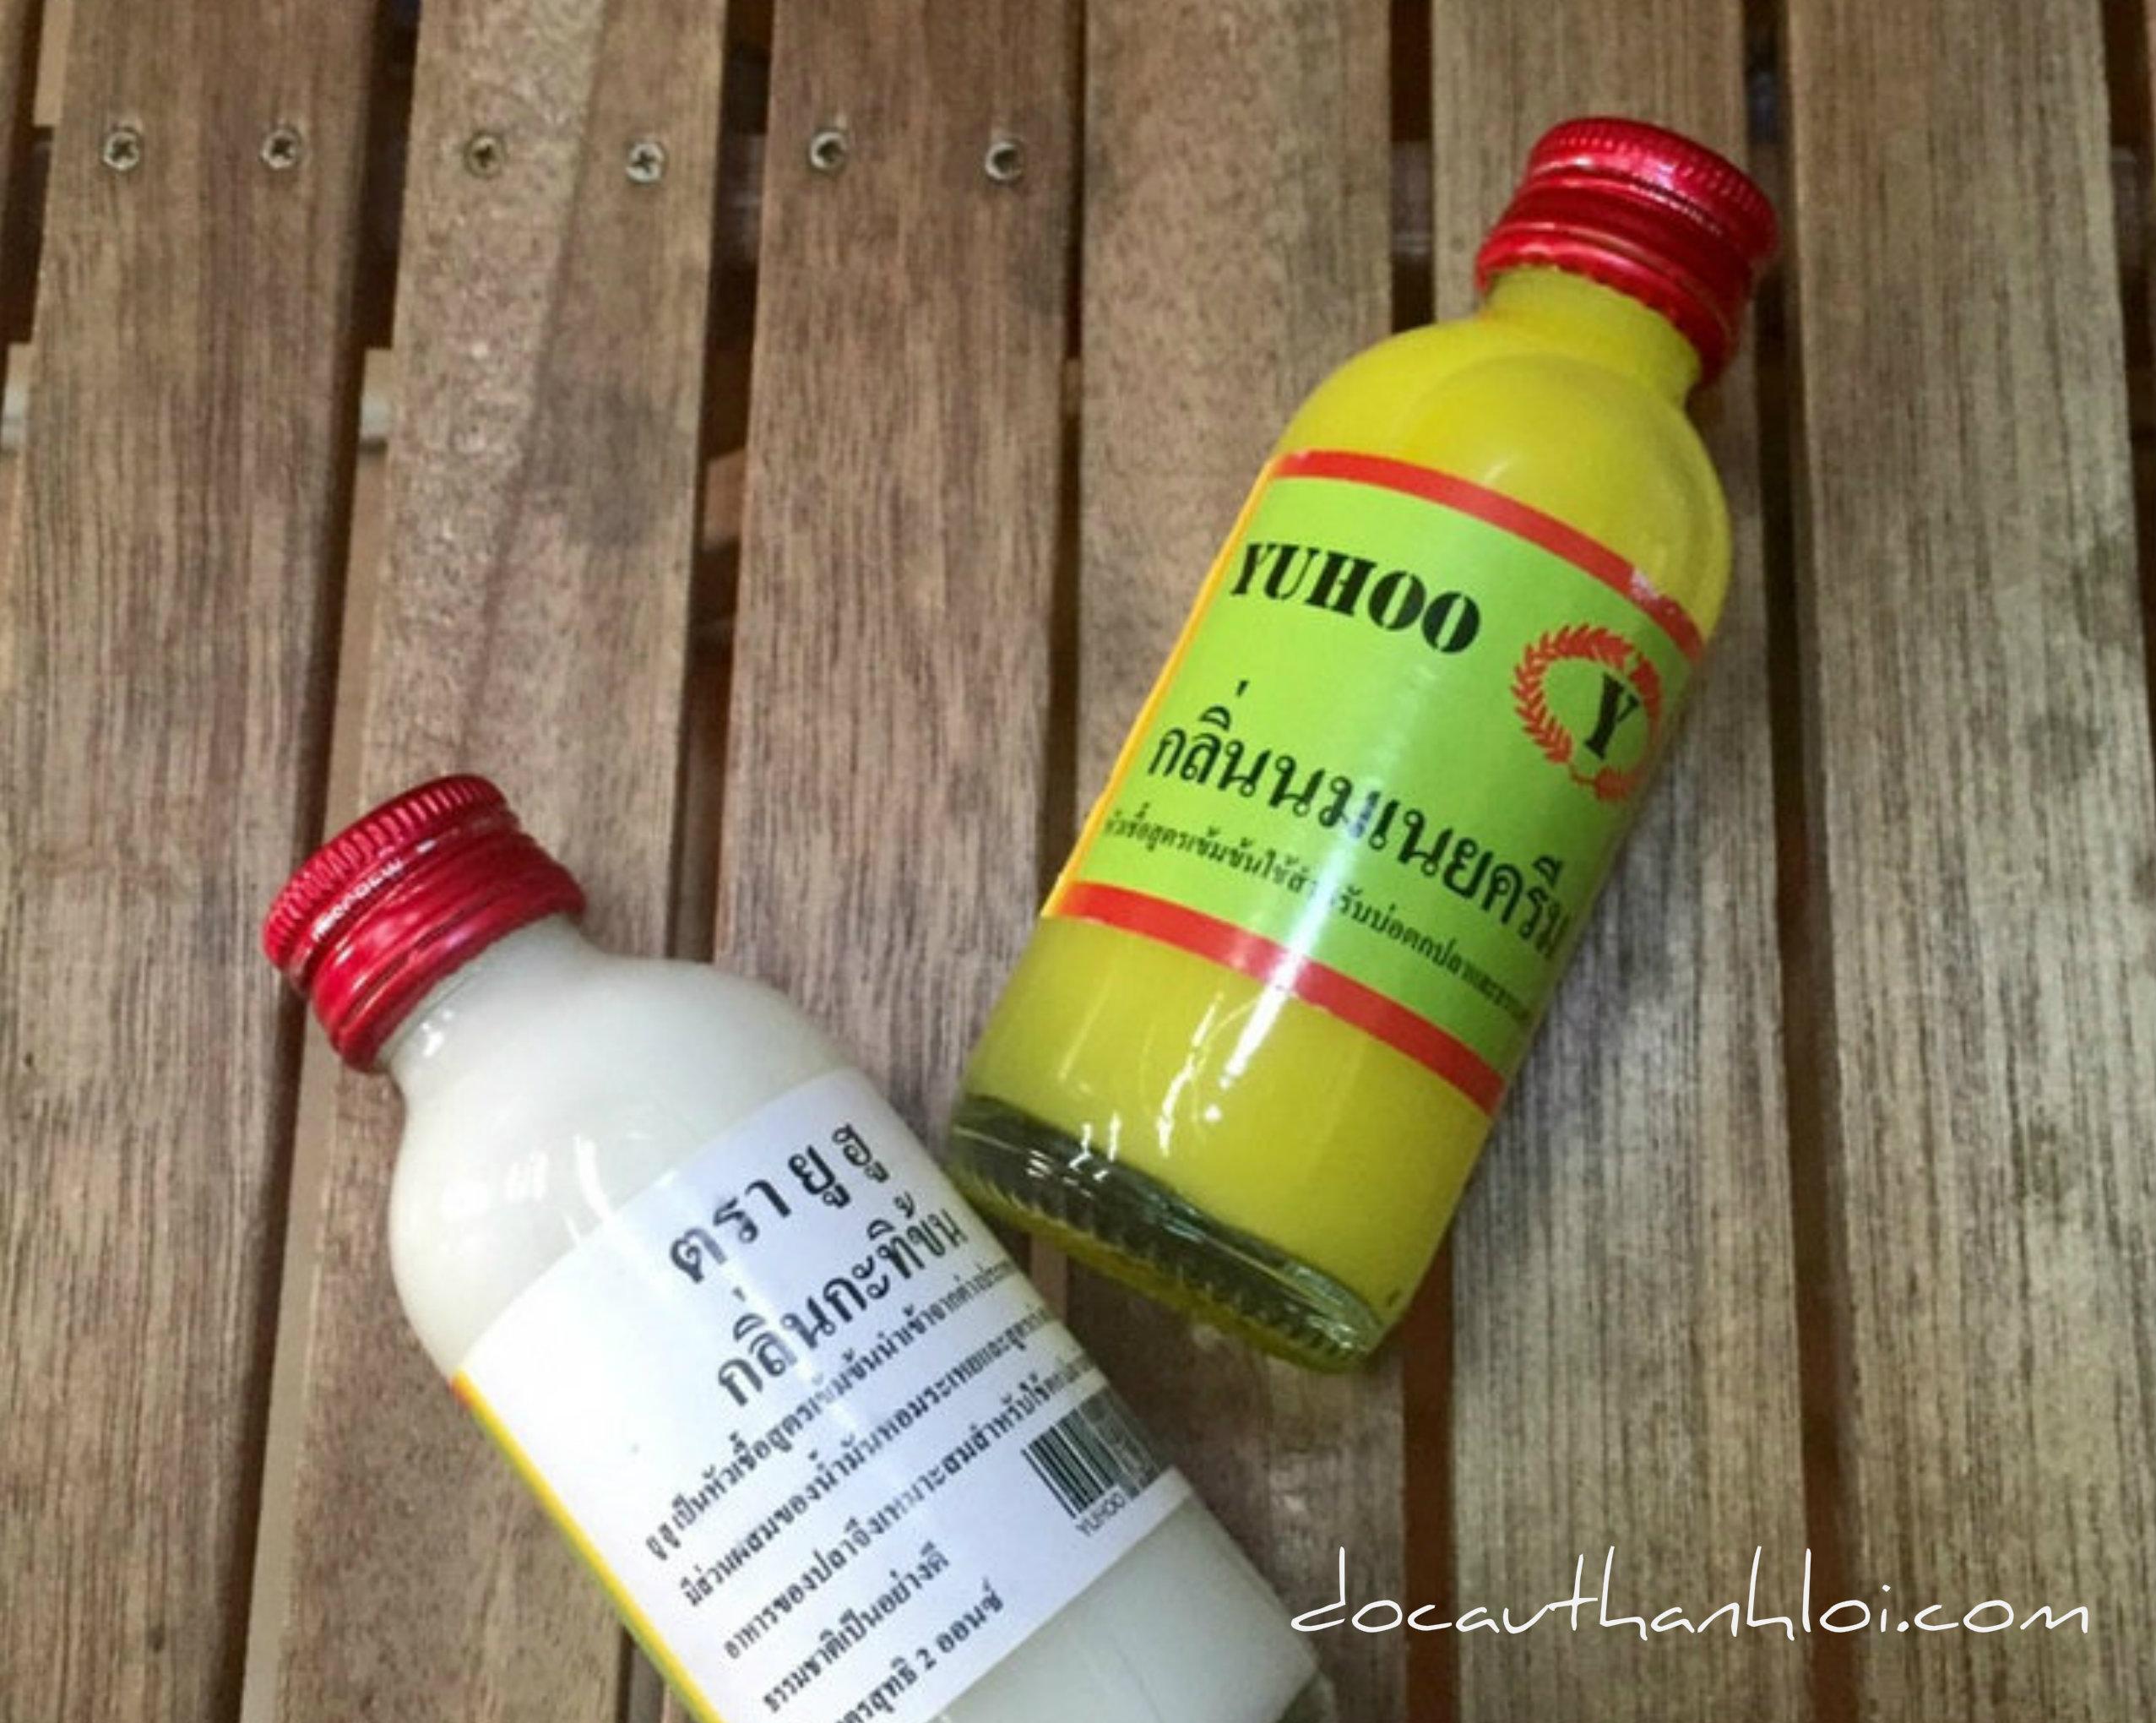 TM007  Tinh Mùi YUHOO Thailand